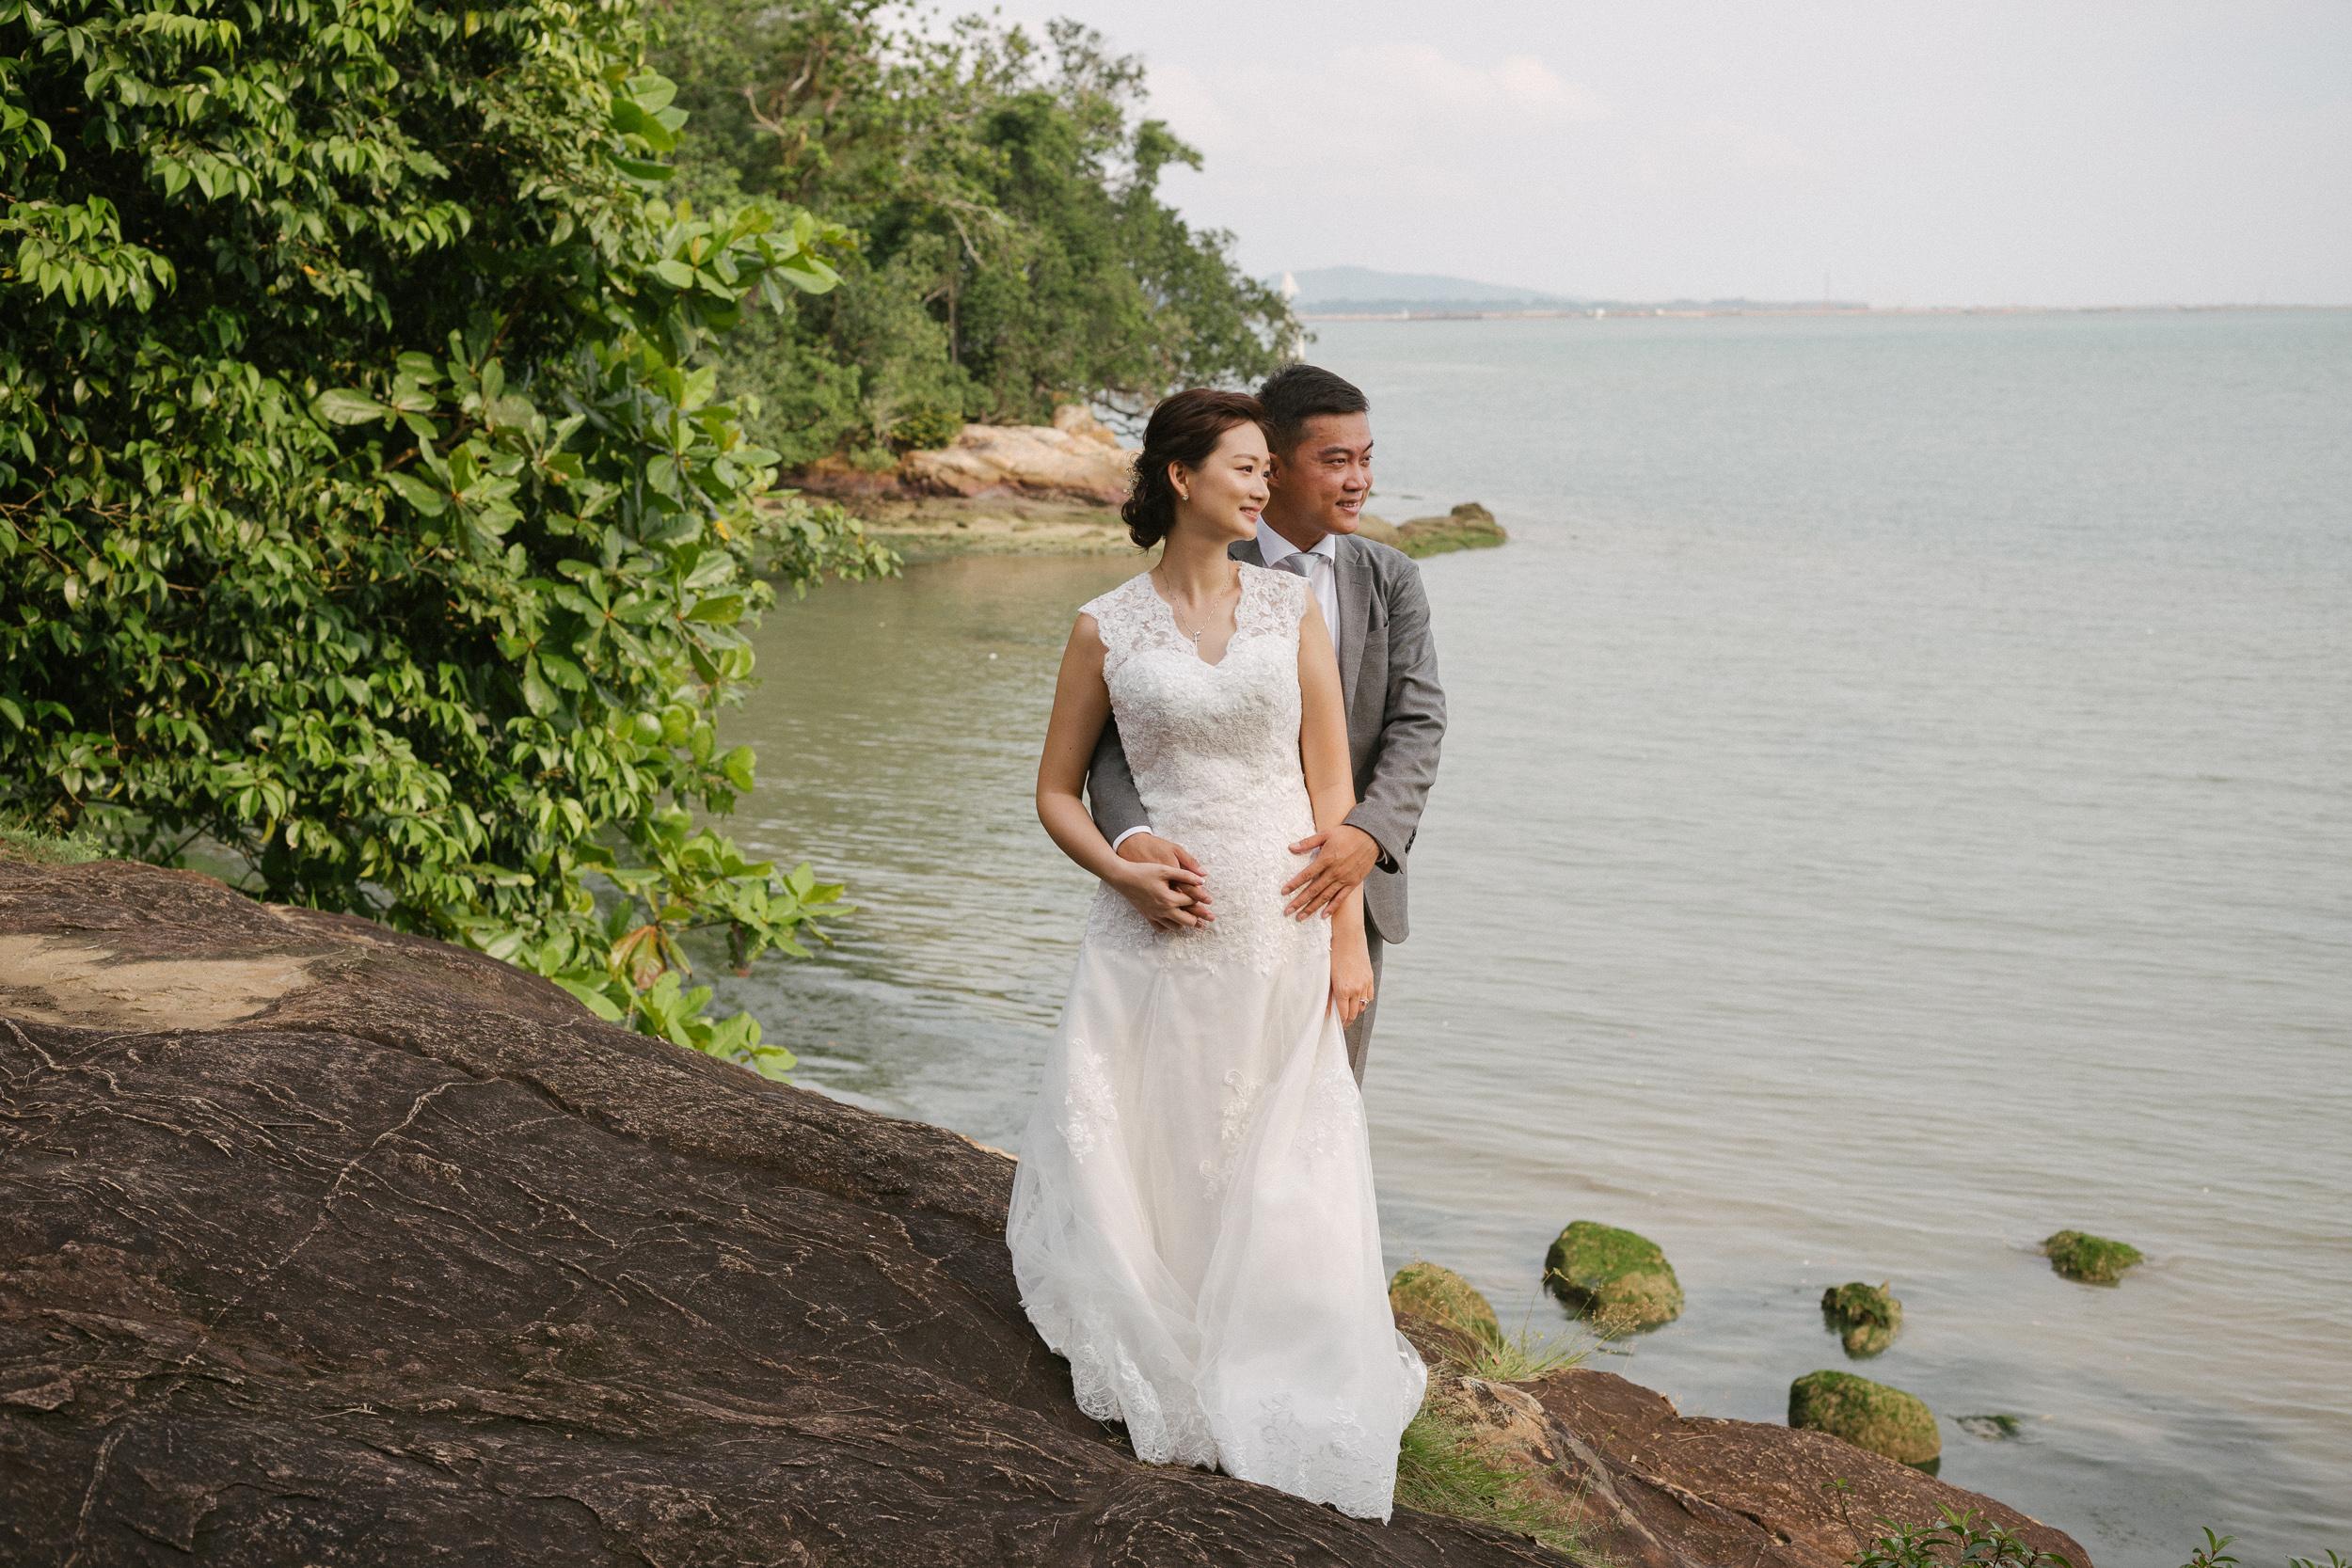 singapore-wedding-photographer-wemadethese-junekit-kingslin-05.jpg